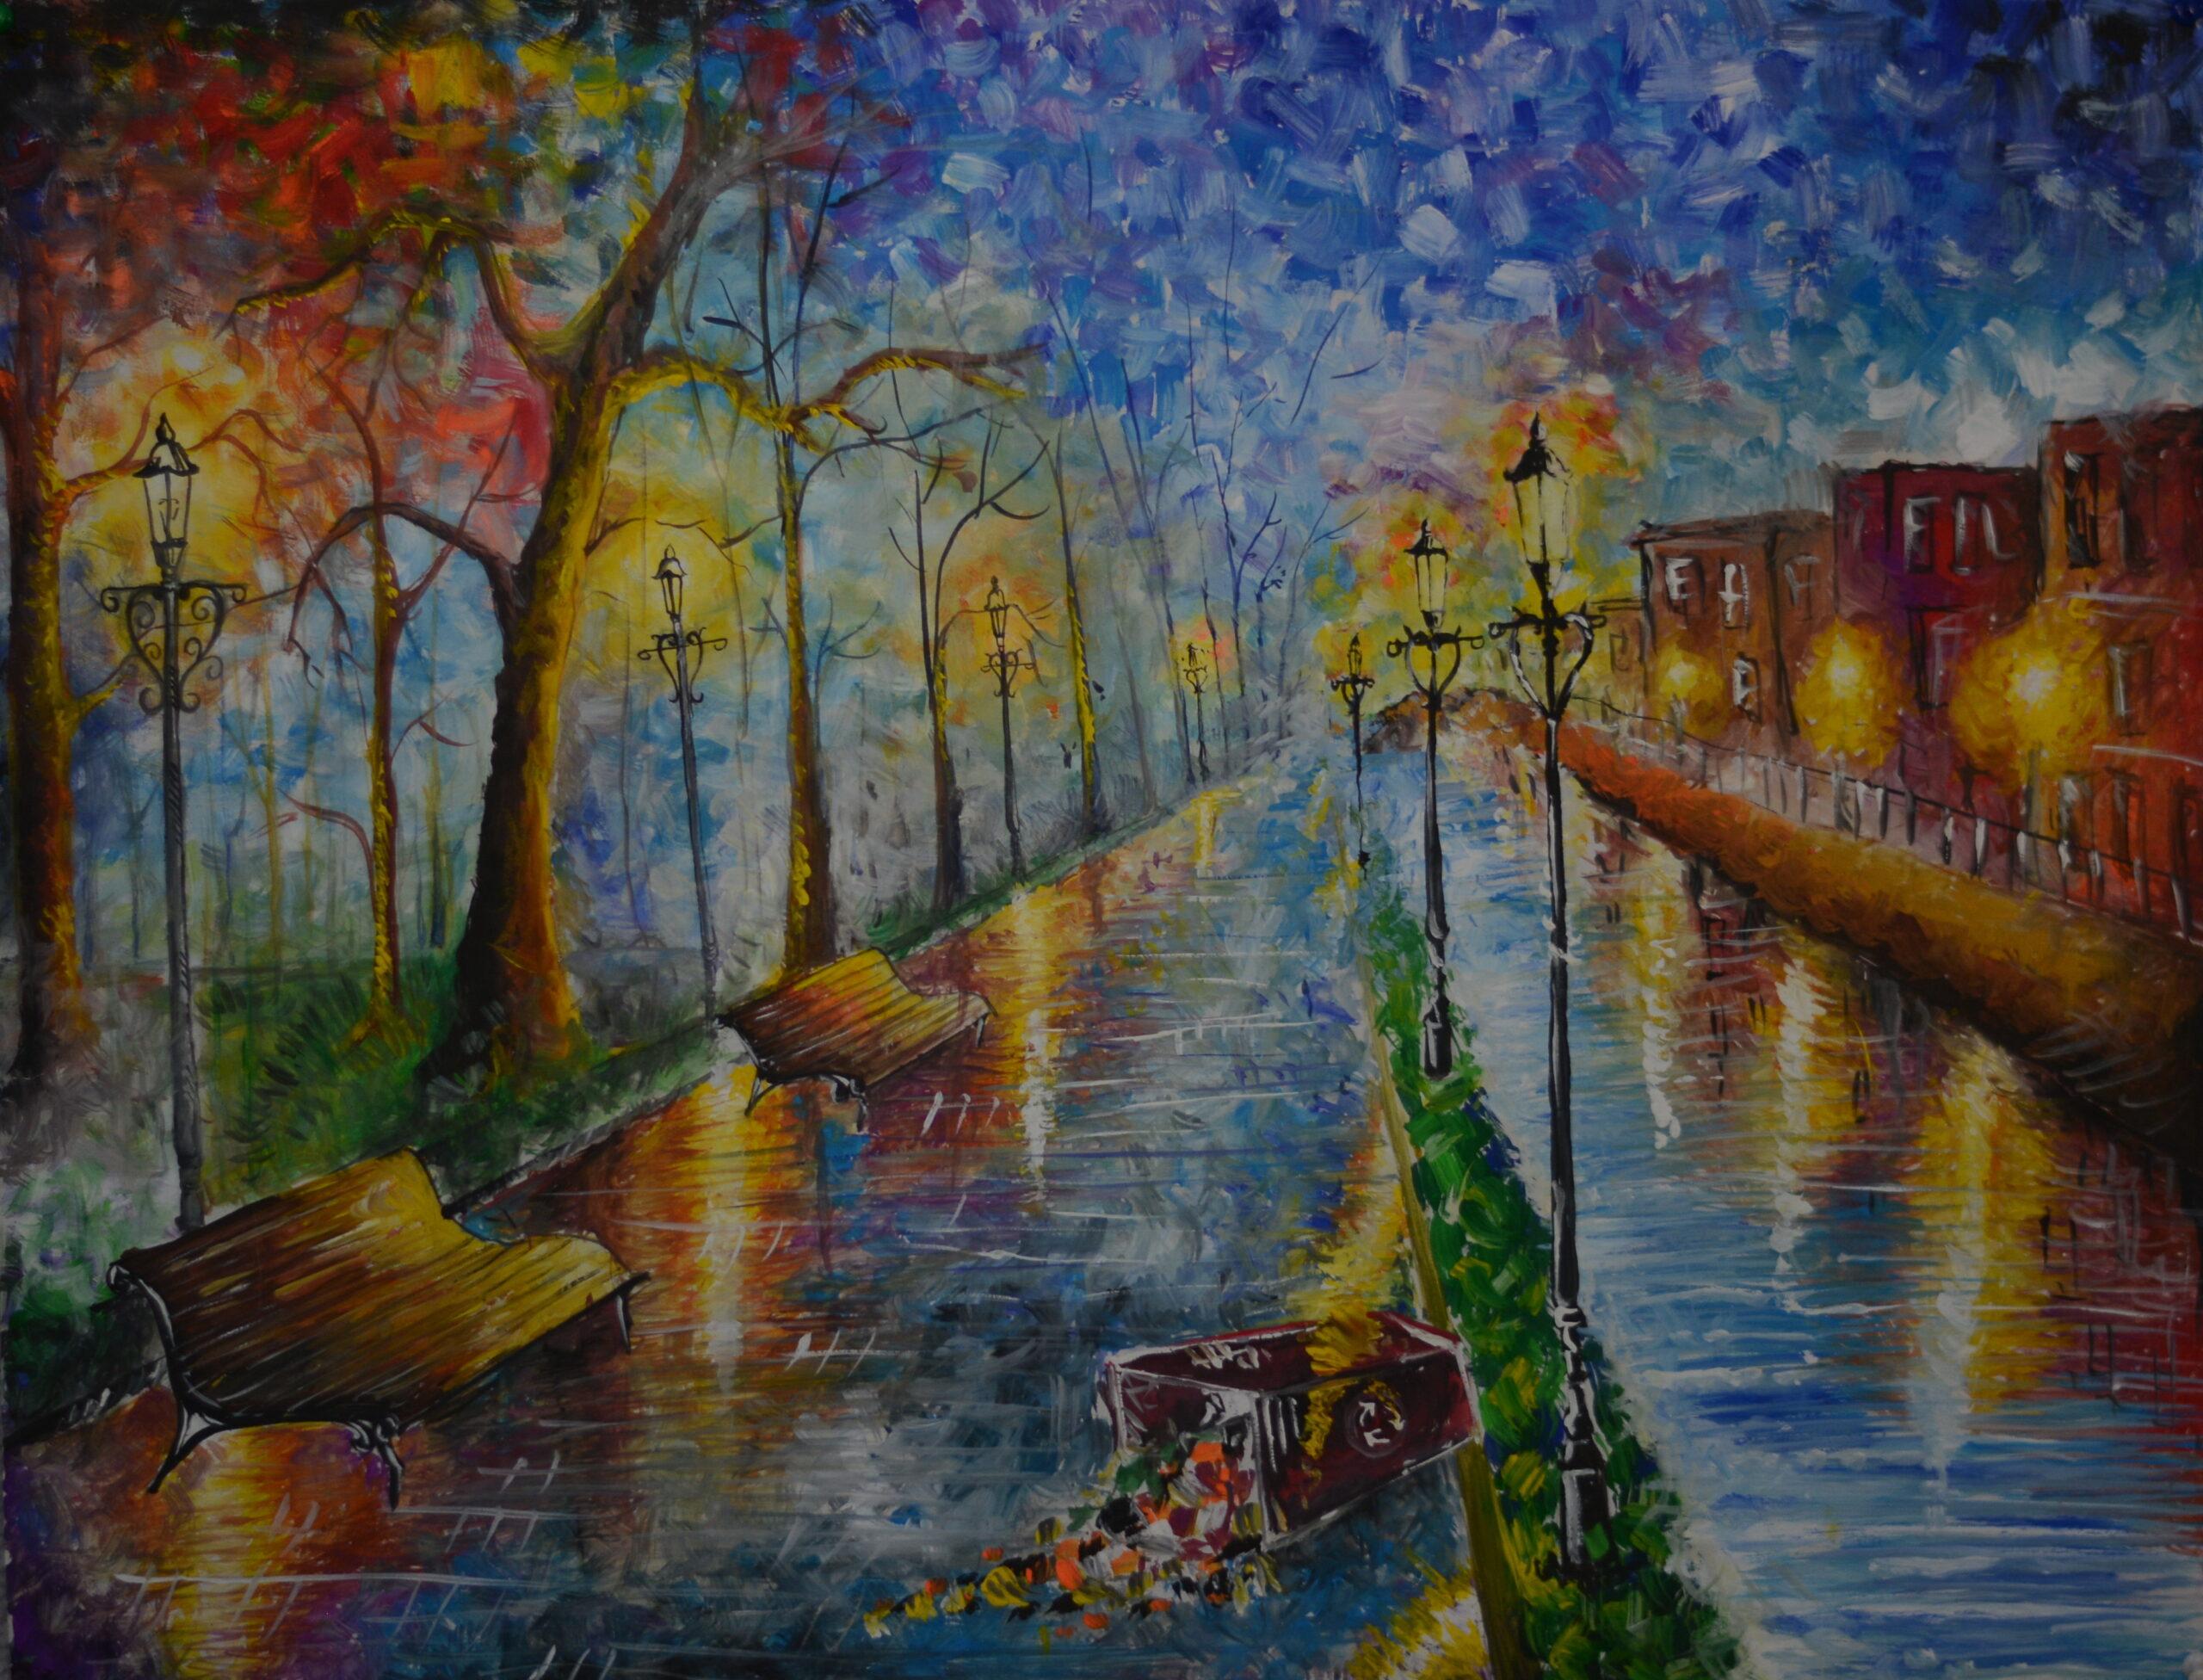 Loneliness_H. M. Venuka Lochana